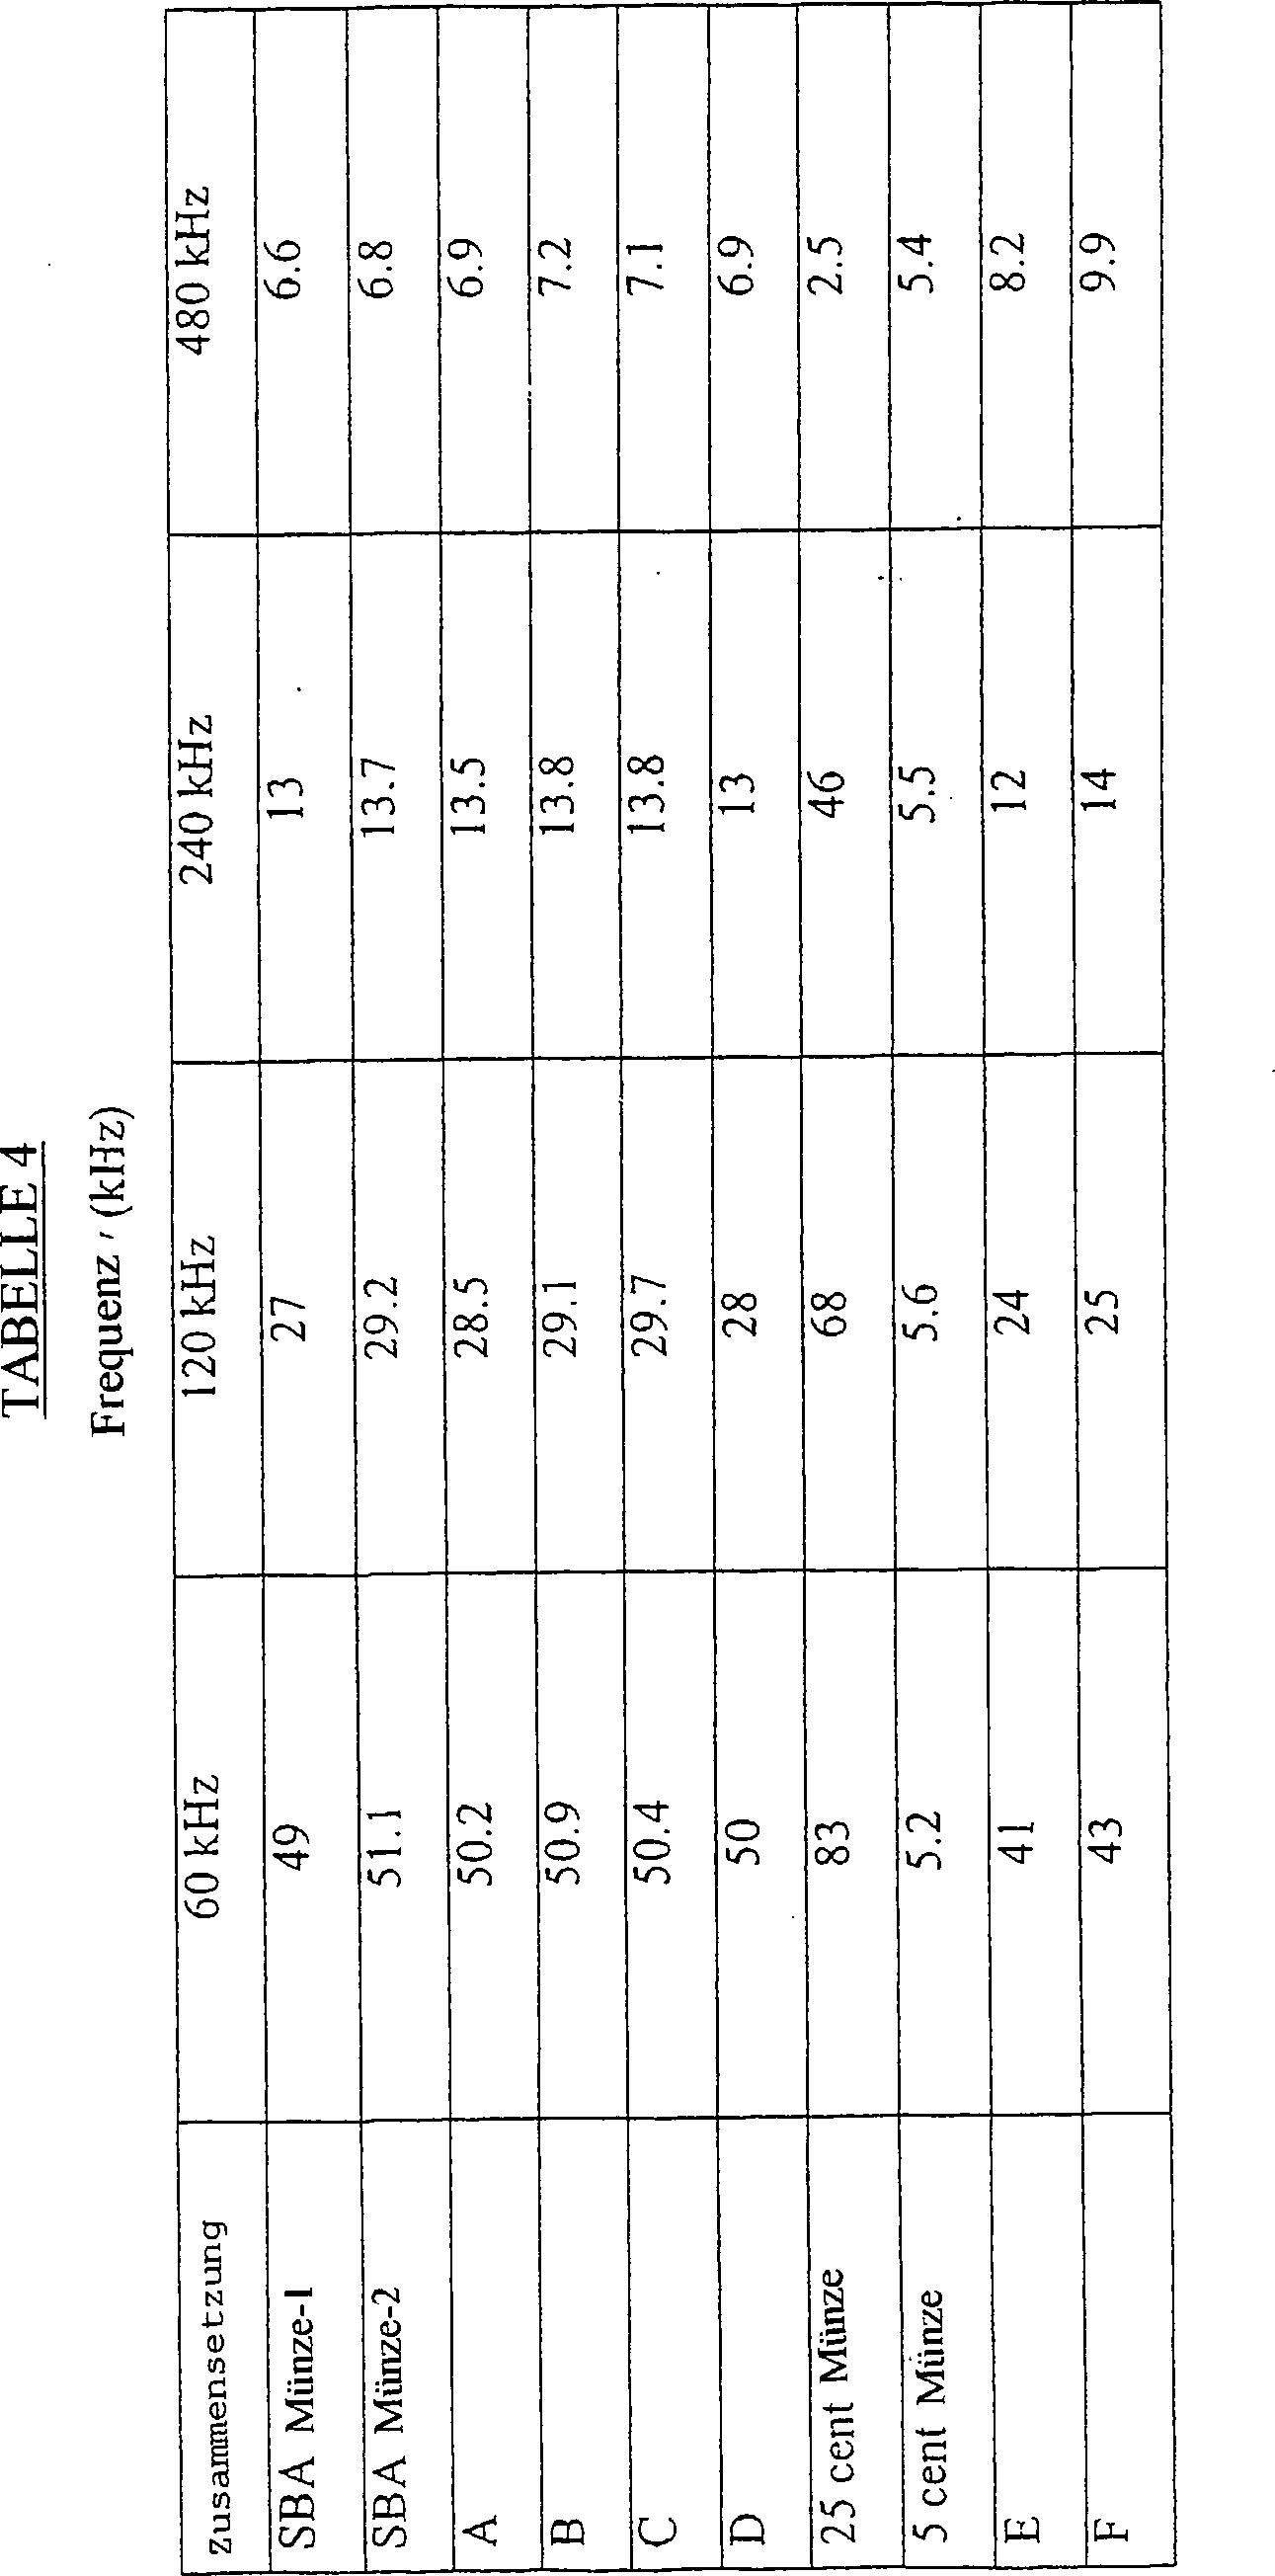 DE60003555T2 - Copper alloy with a golden look - Google Patents